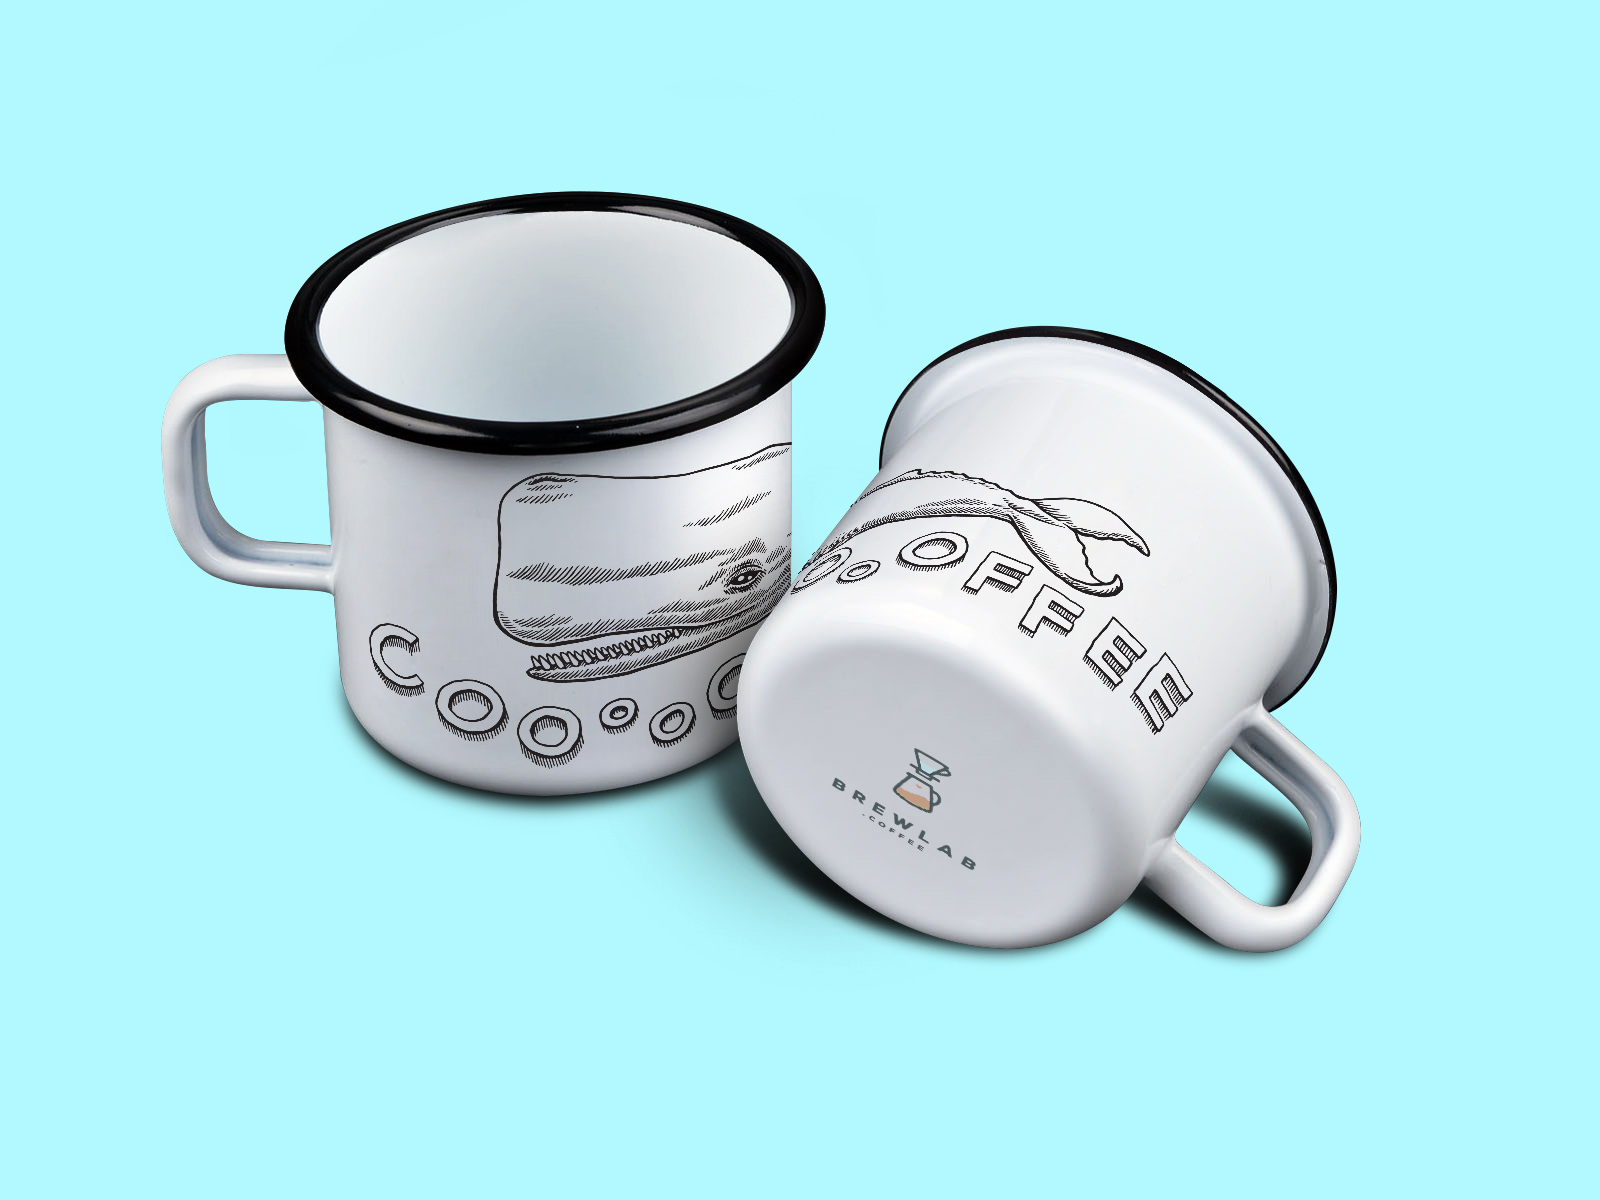 Enamel mug design with the whale mascot.